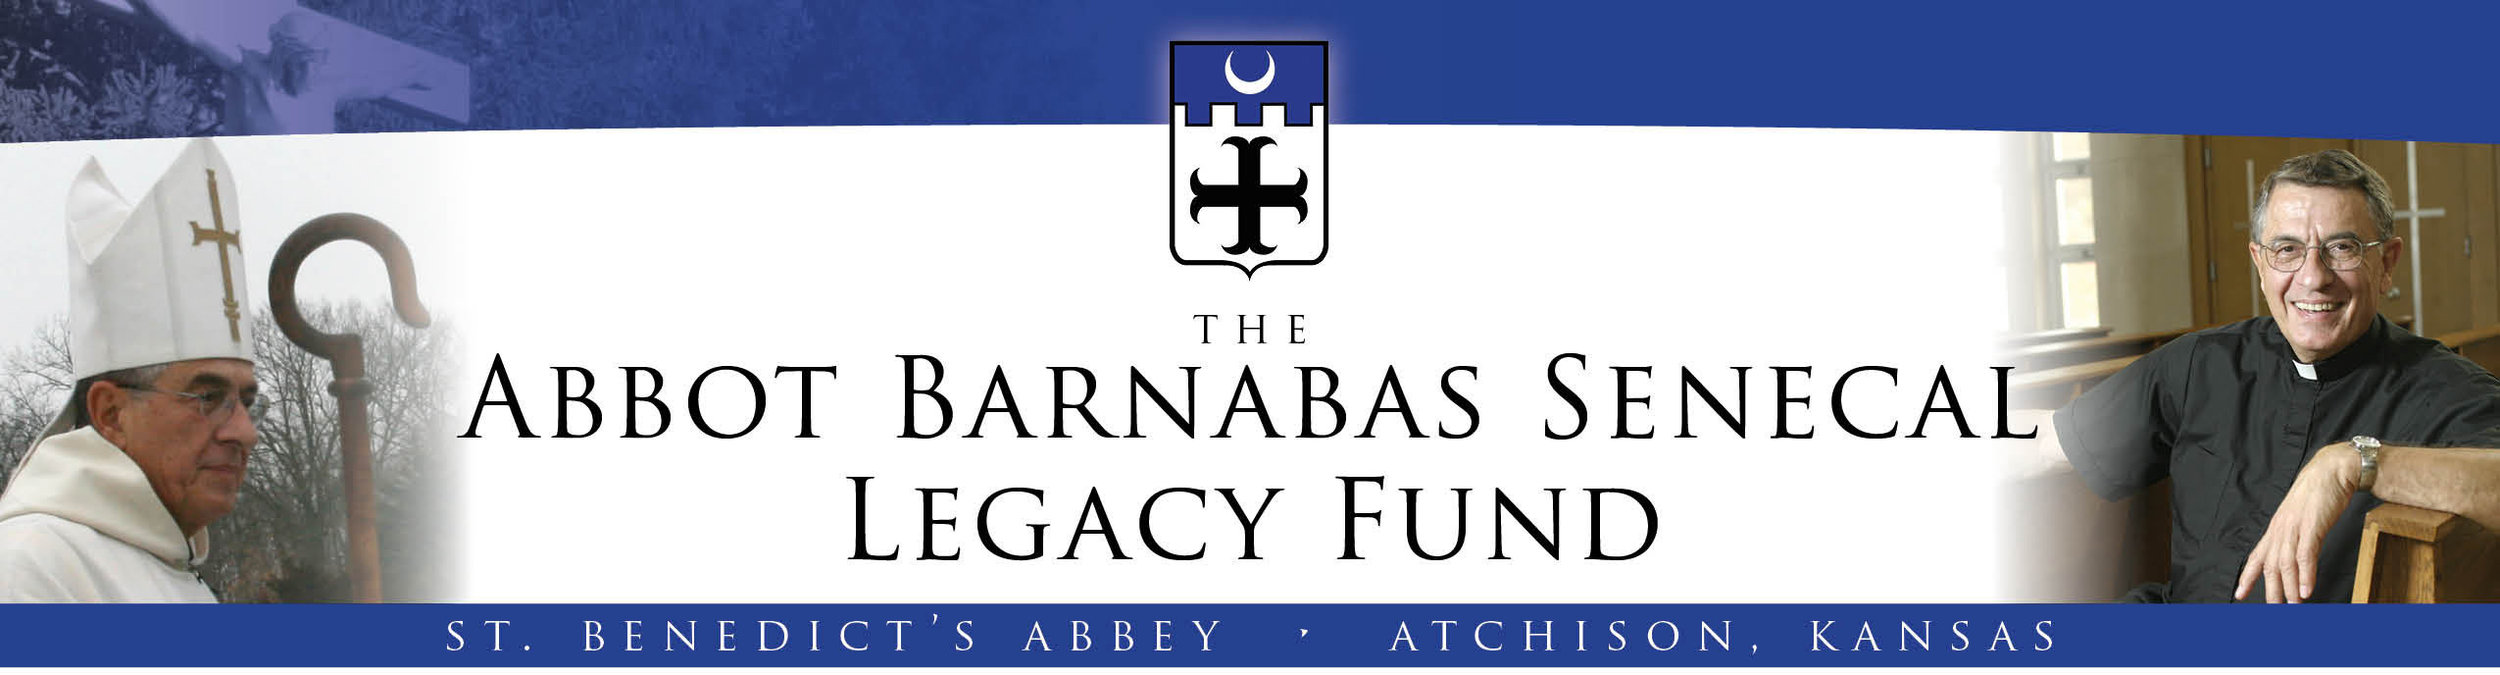 BarnabasSenecal_LegacyFund-head.jpg